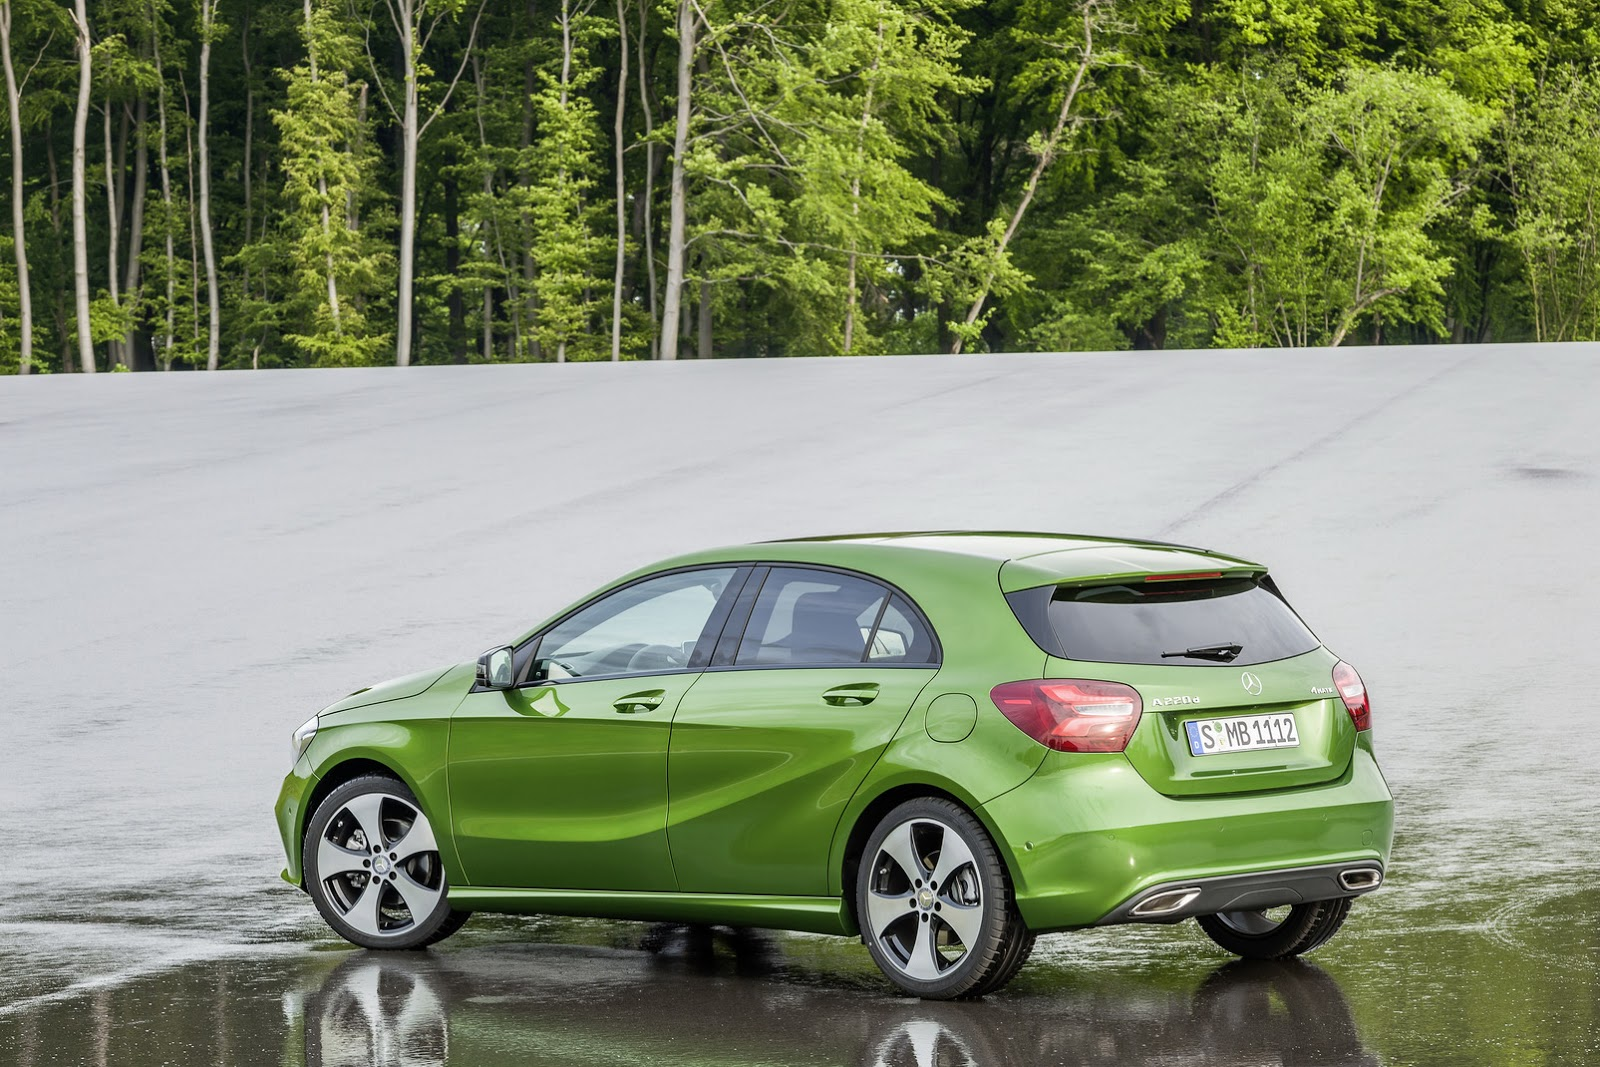 http://3.bp.blogspot.com/-Tqi0G8kJQG4/VY3VaYu6SNI/AAAAAAABBkk/pL_c6bfSaAA/s1600/2016-Mercedes-A-Class-11.jpg